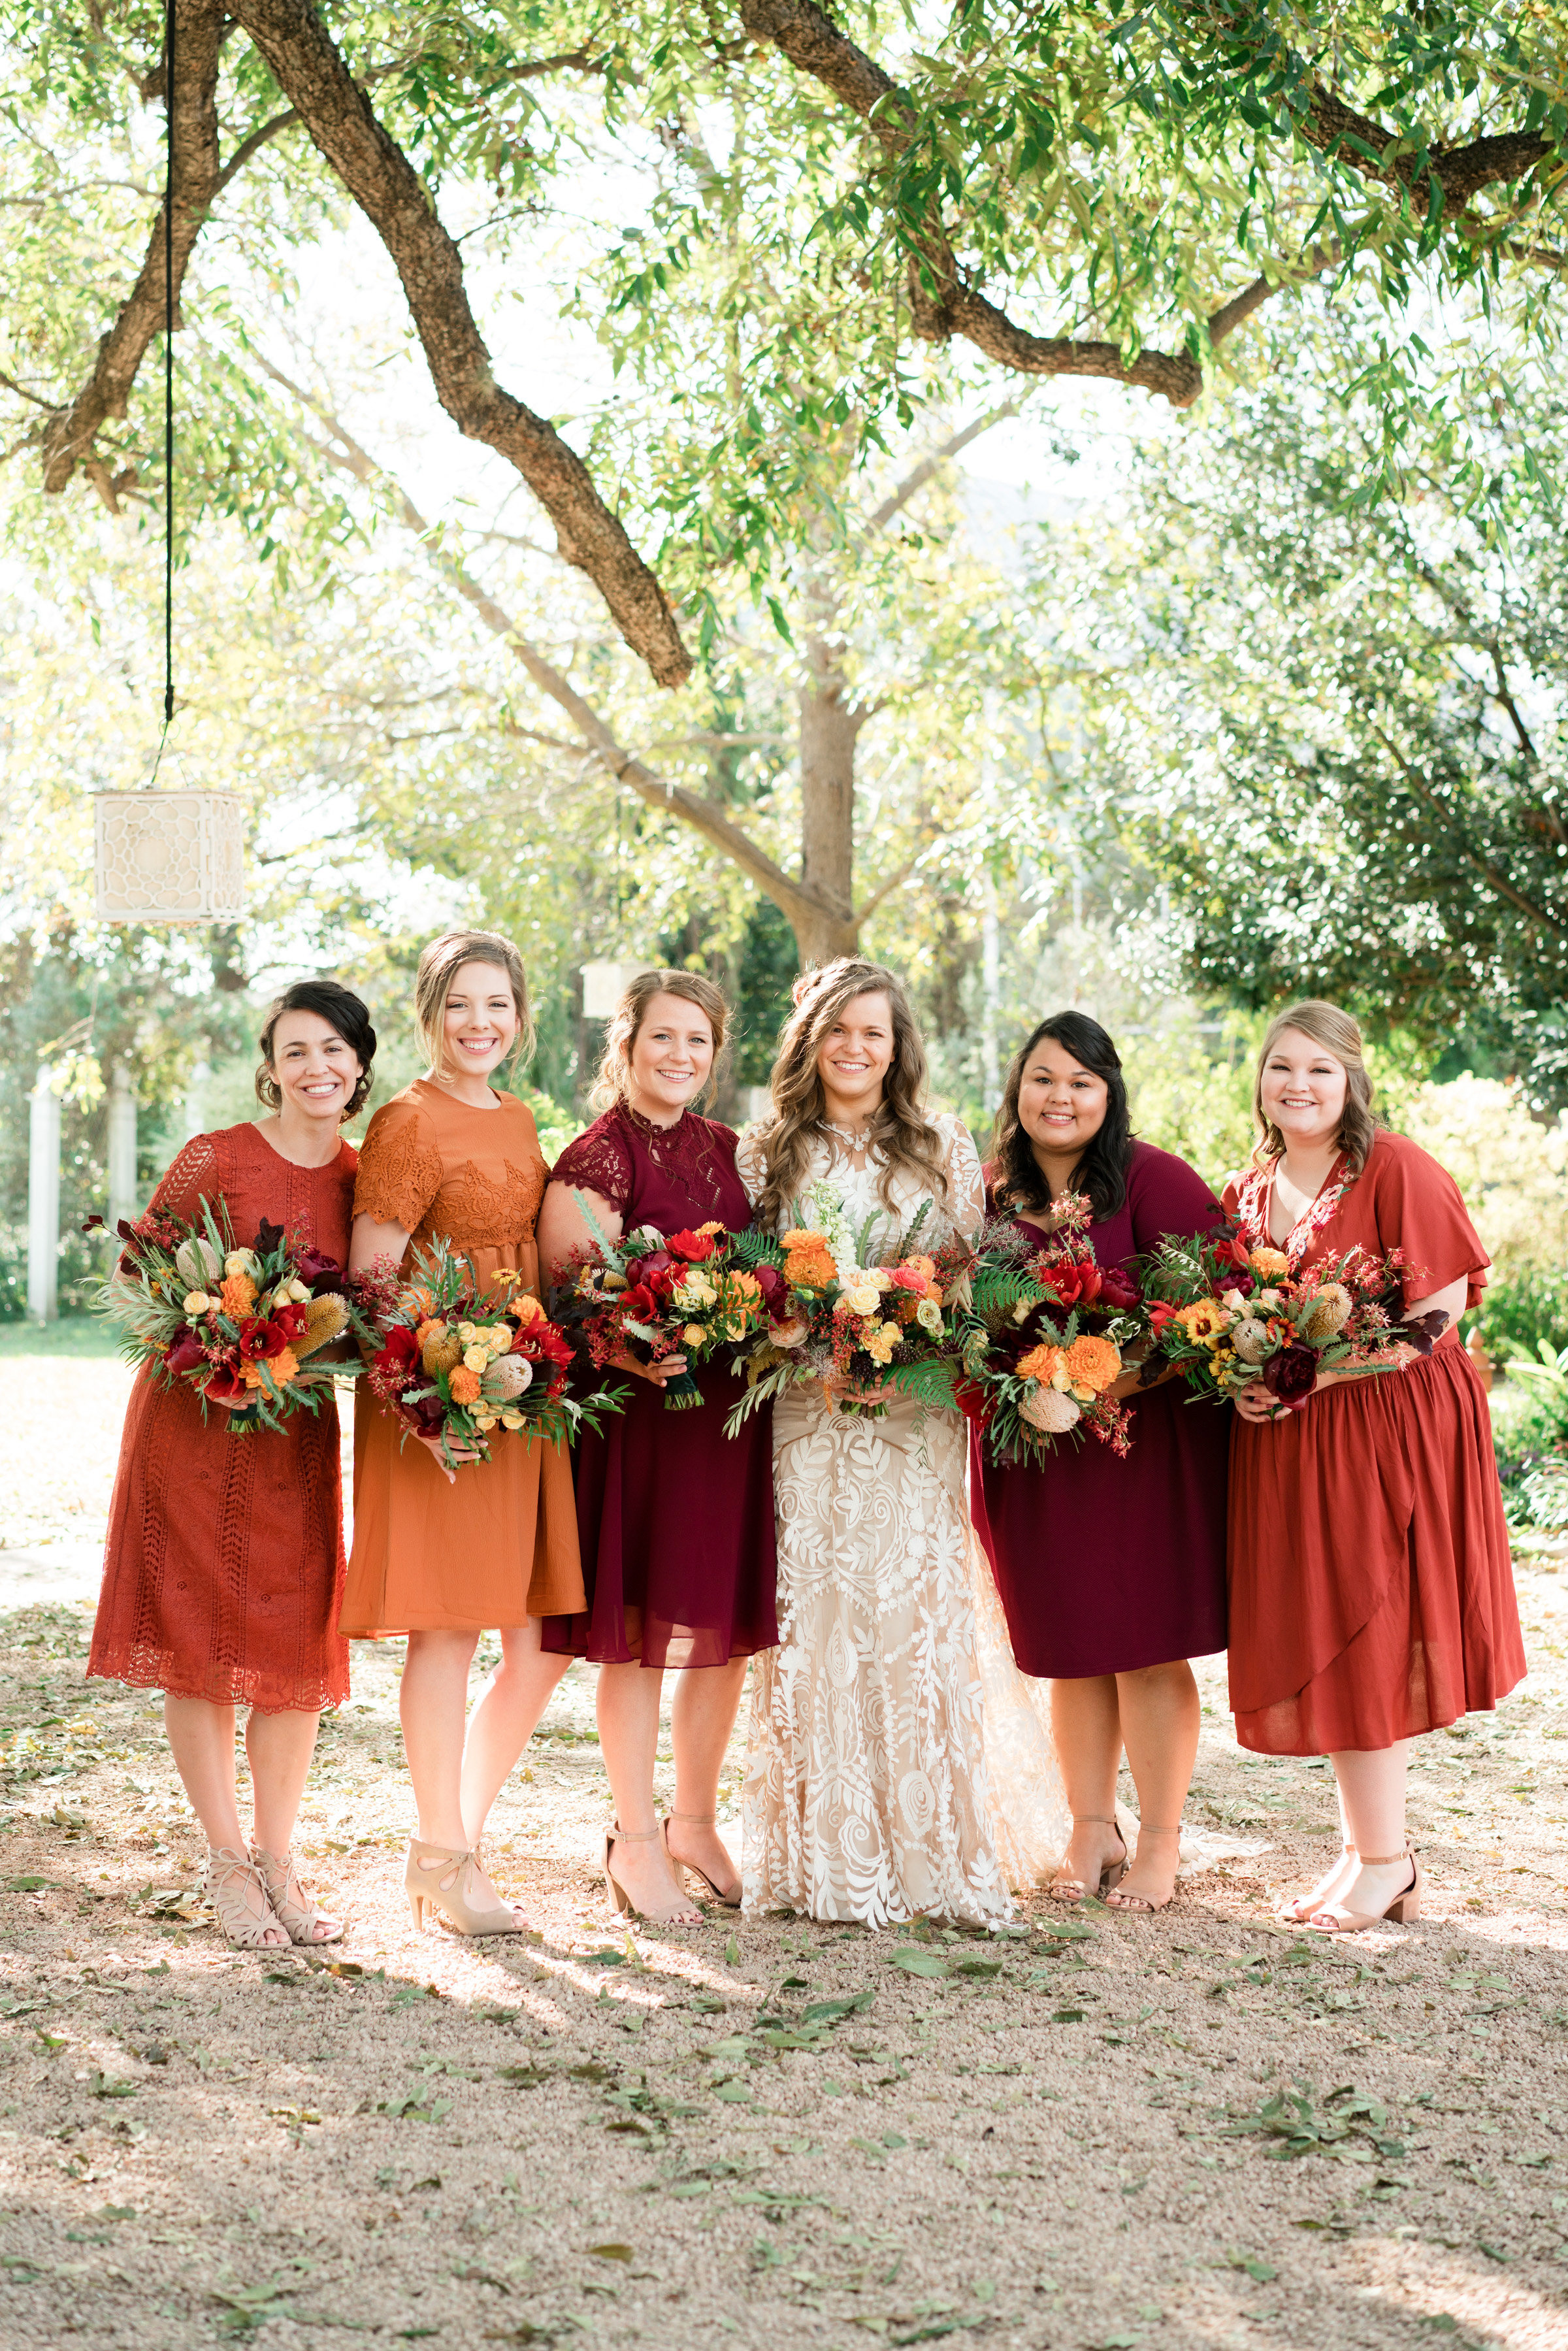 hayleigh corey wedding bridesmaids and bride